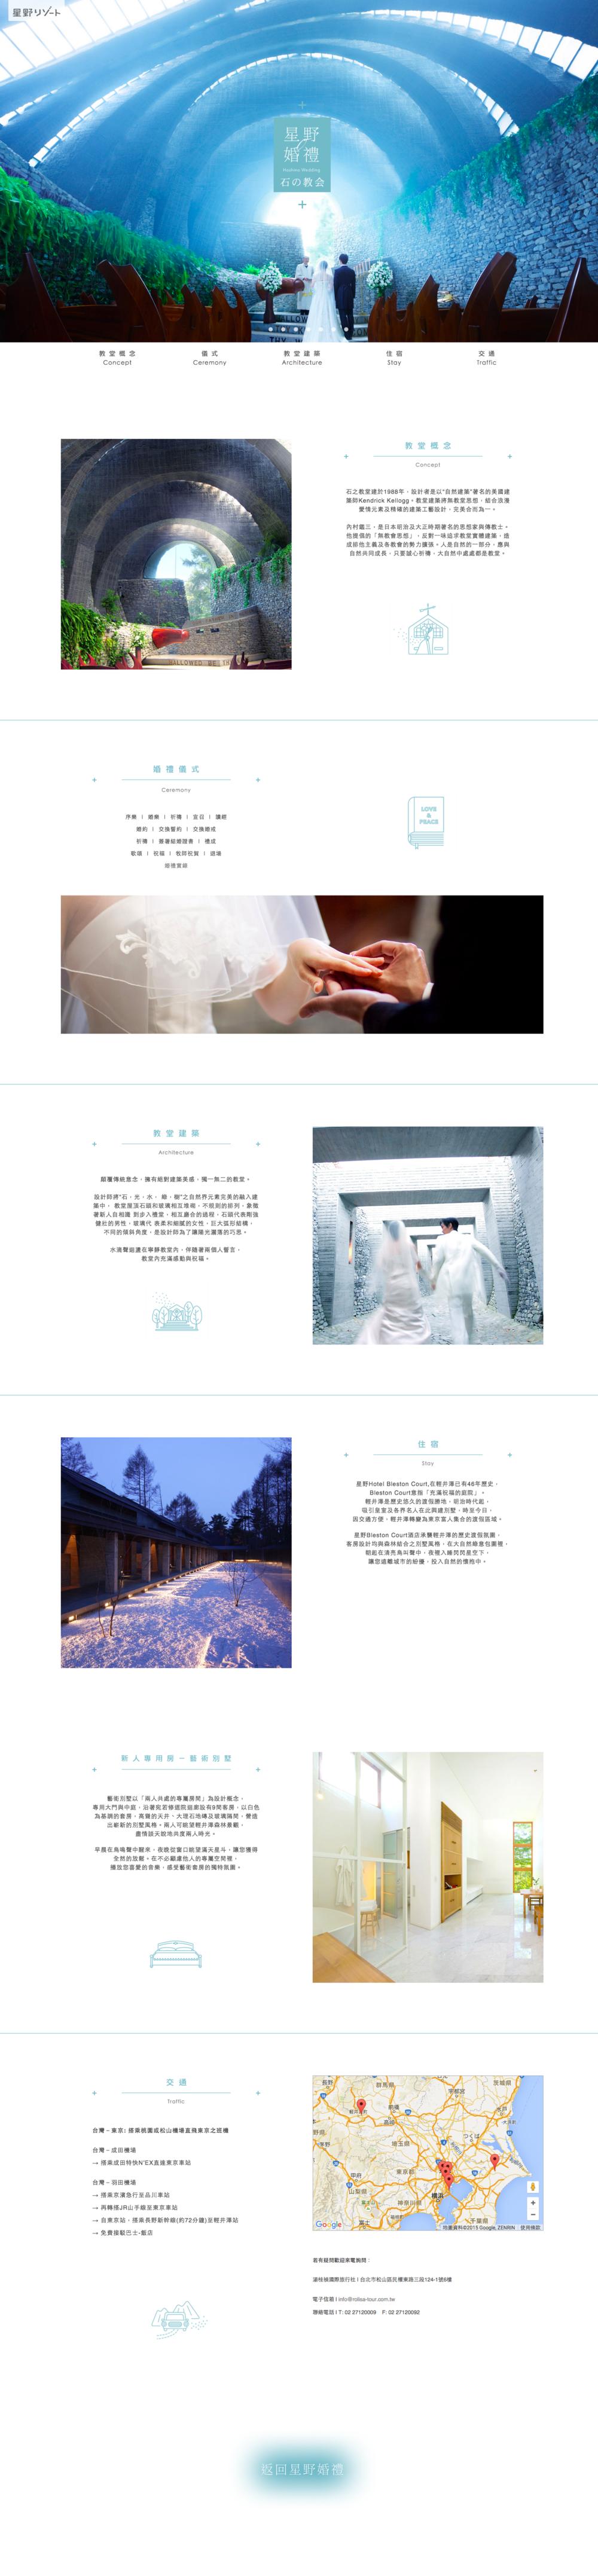 星野婚禮_stone.png